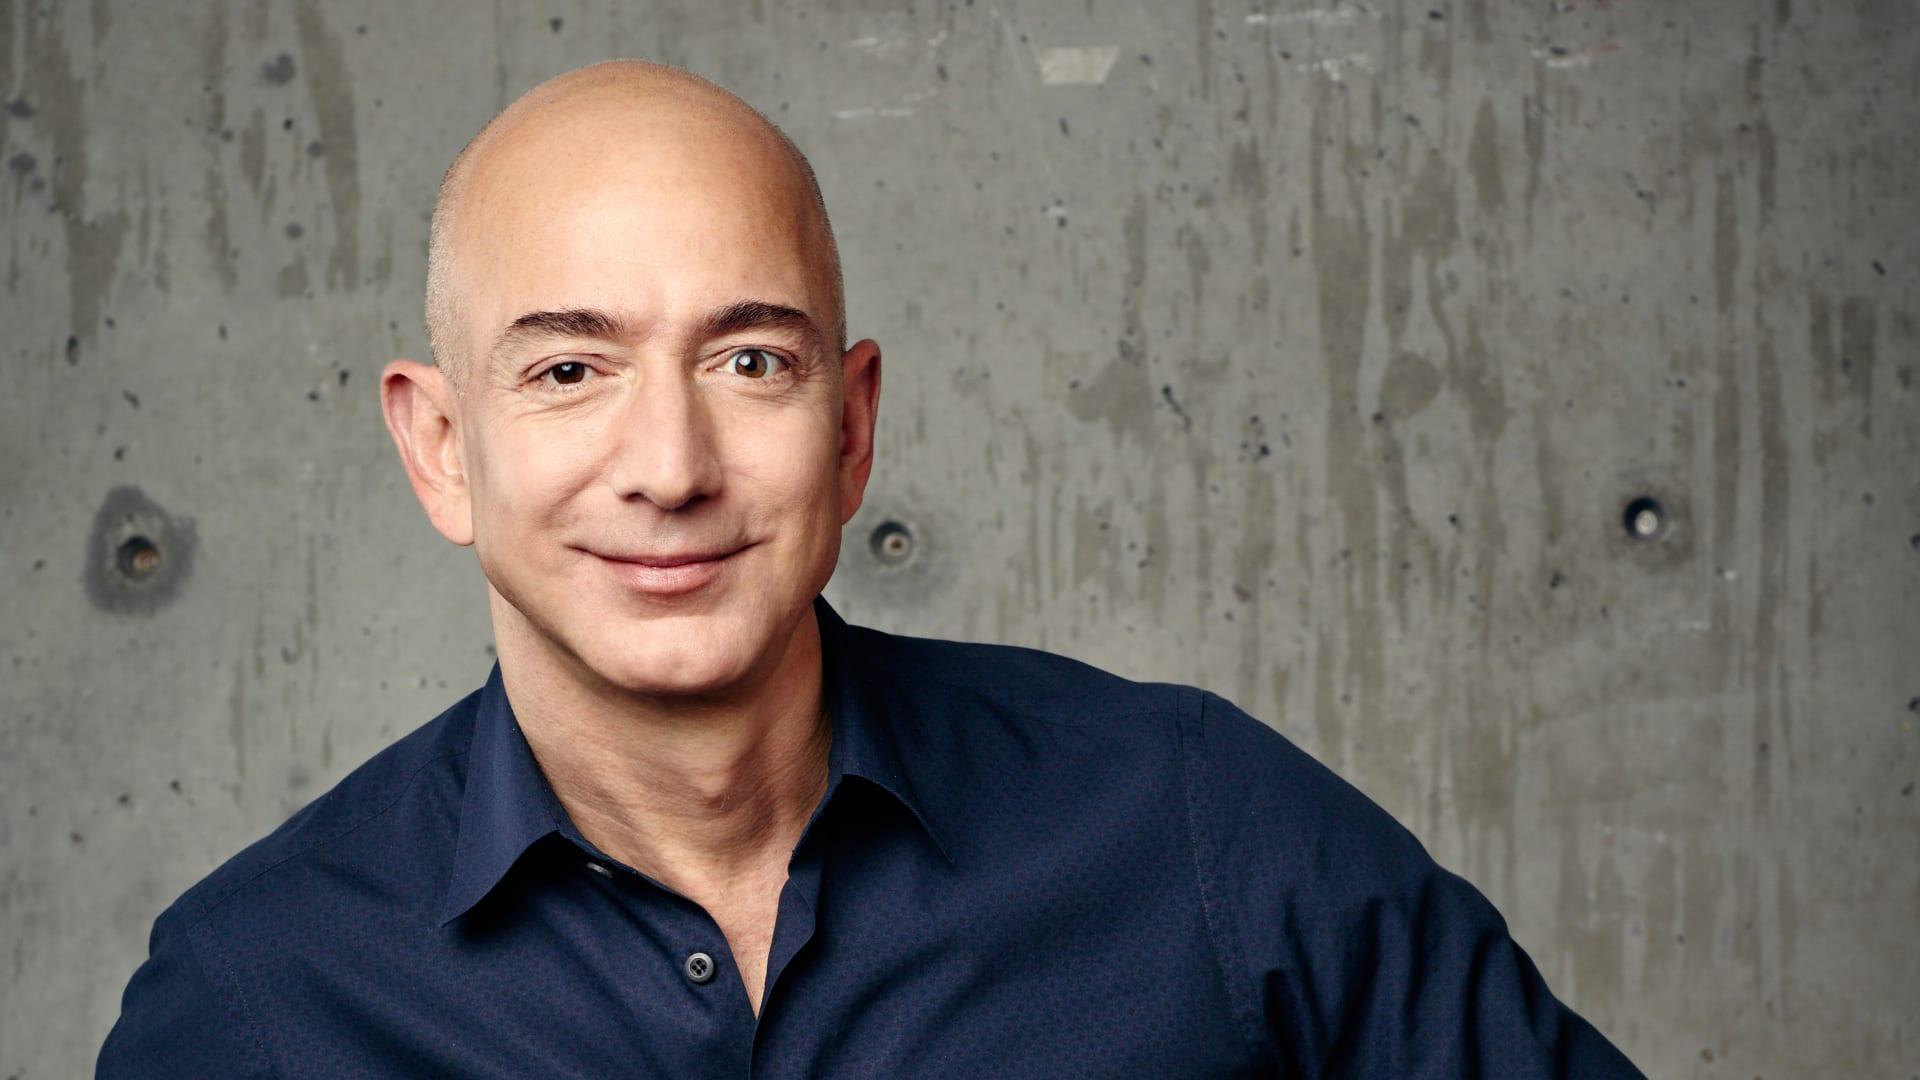 Whats next for Jeff Bezos